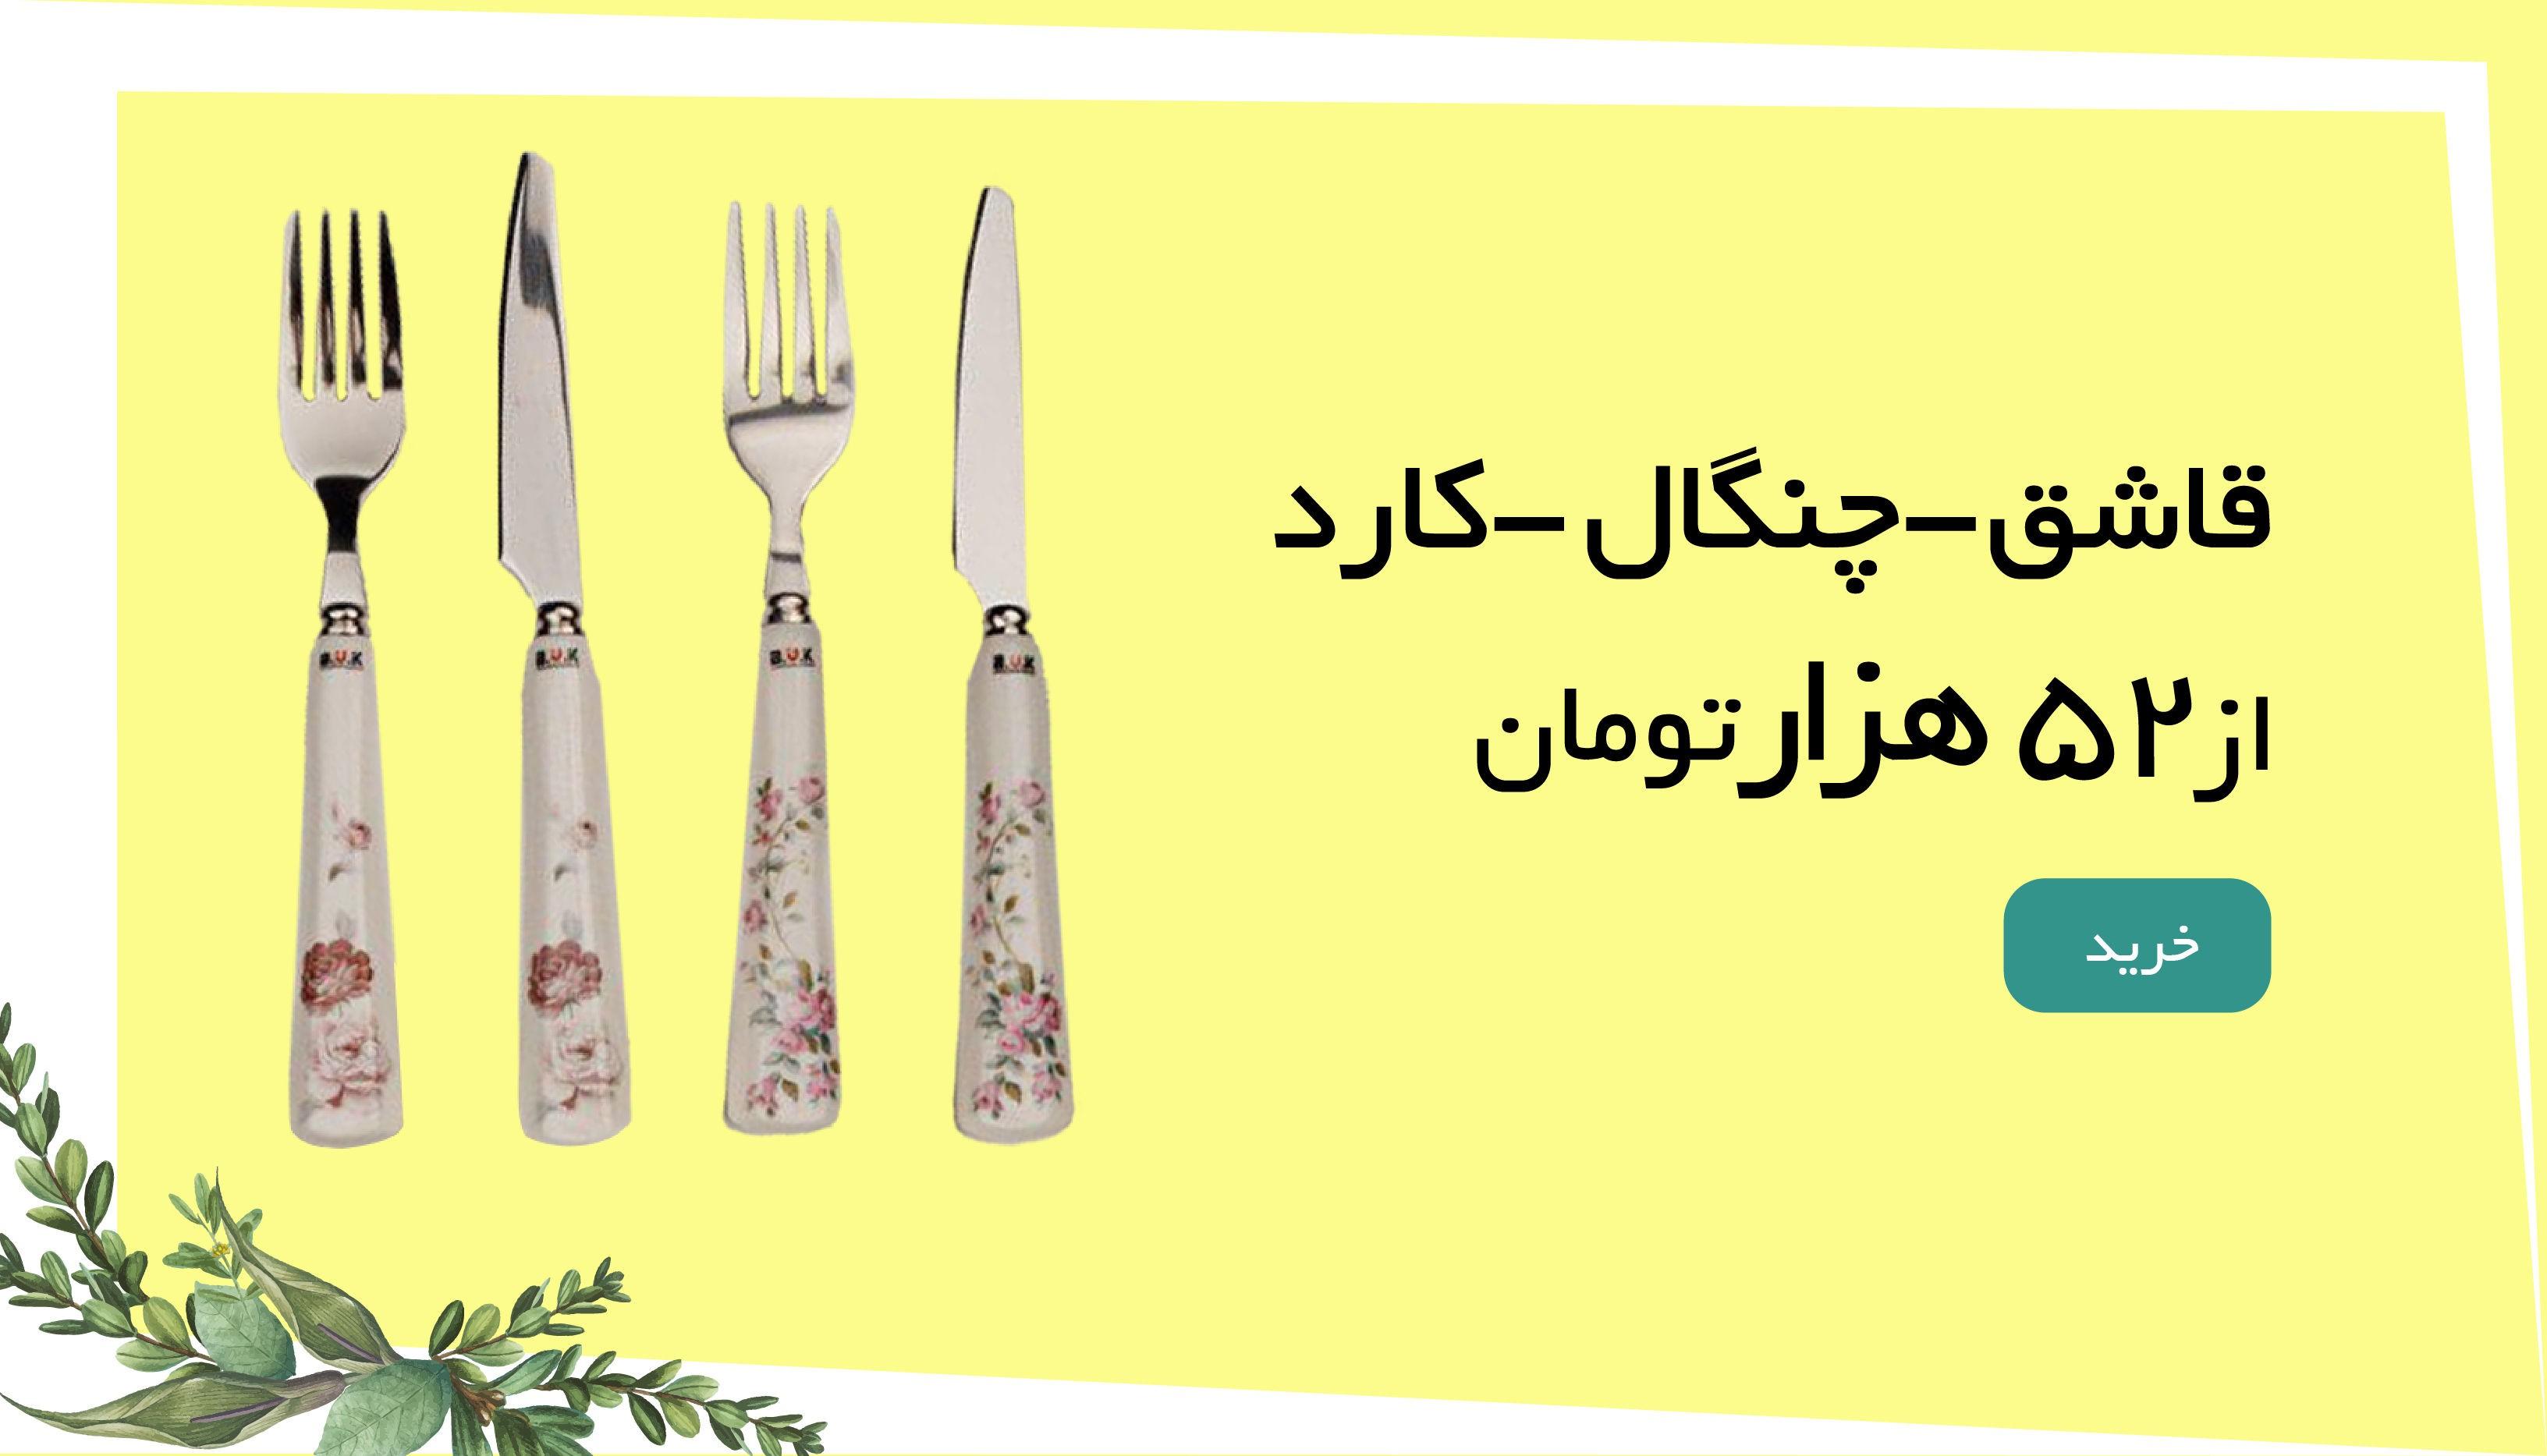 spoon $fork